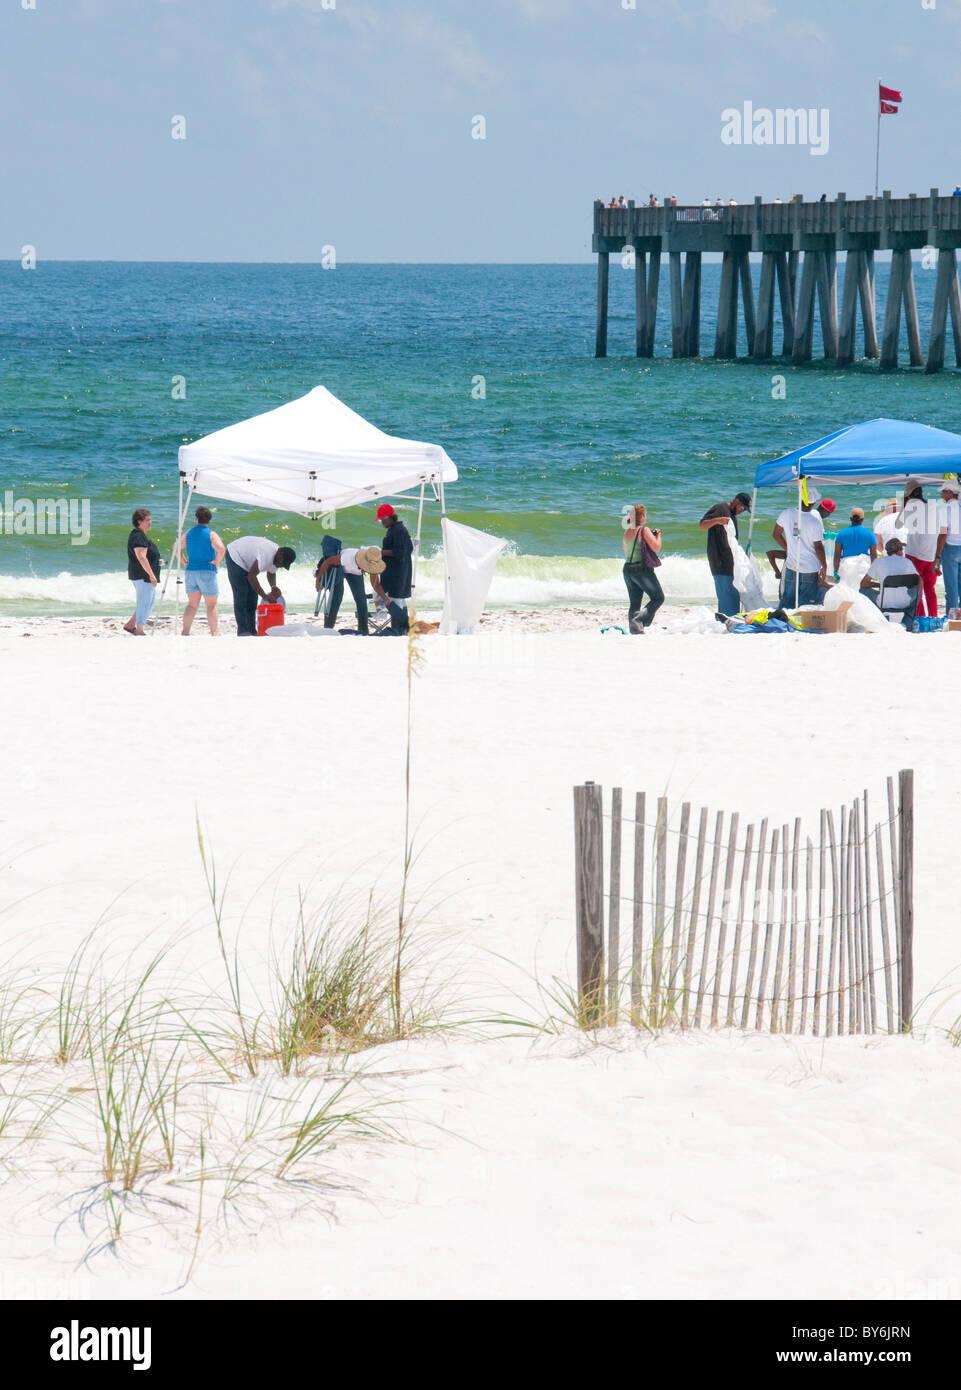 Pensacola Beach devoid of toursists a season's peak as BP workers remove oil - Stock Image